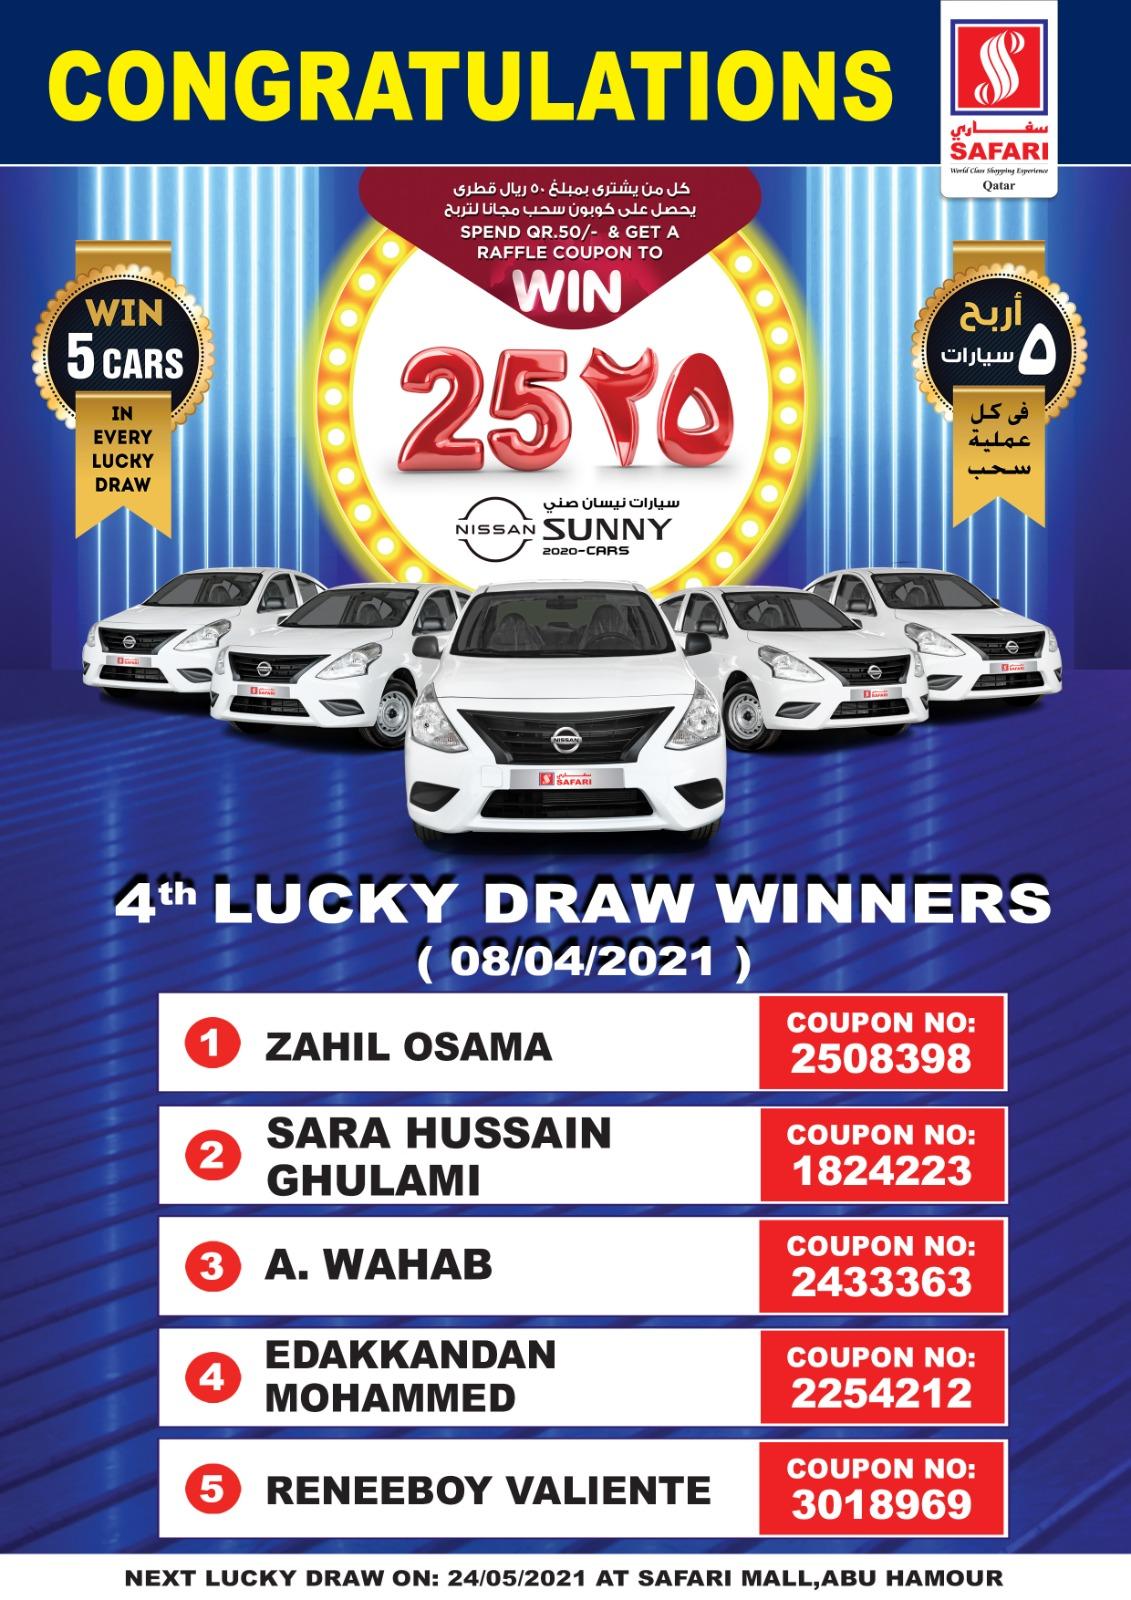 4th lucky draw winner